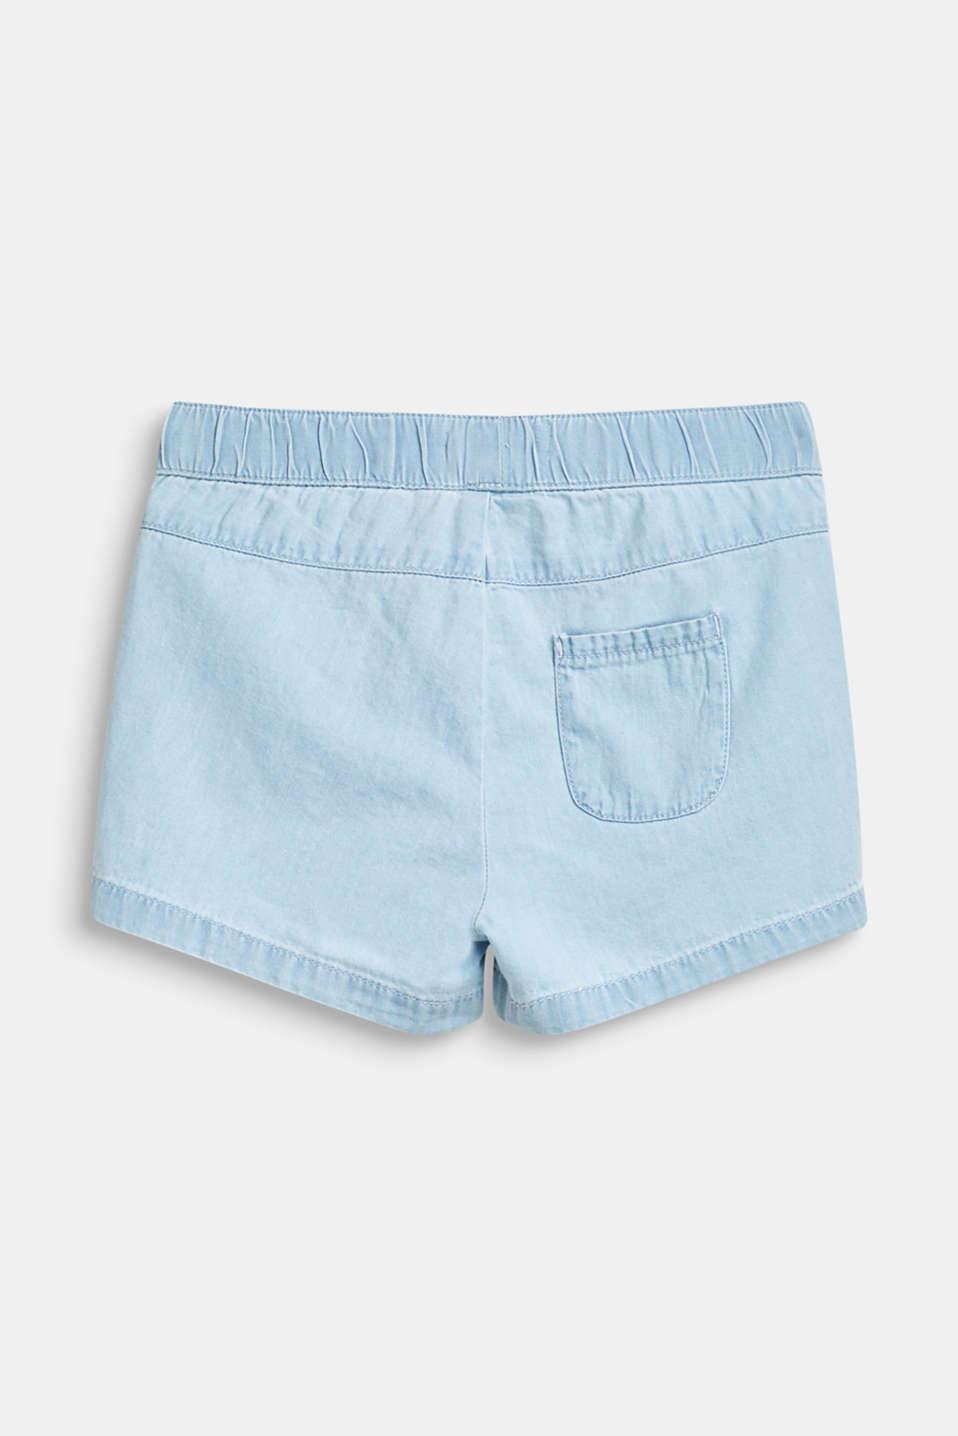 Frill detail denim shorts, 100% cotton, BLEACHED DENIM, detail image number 1